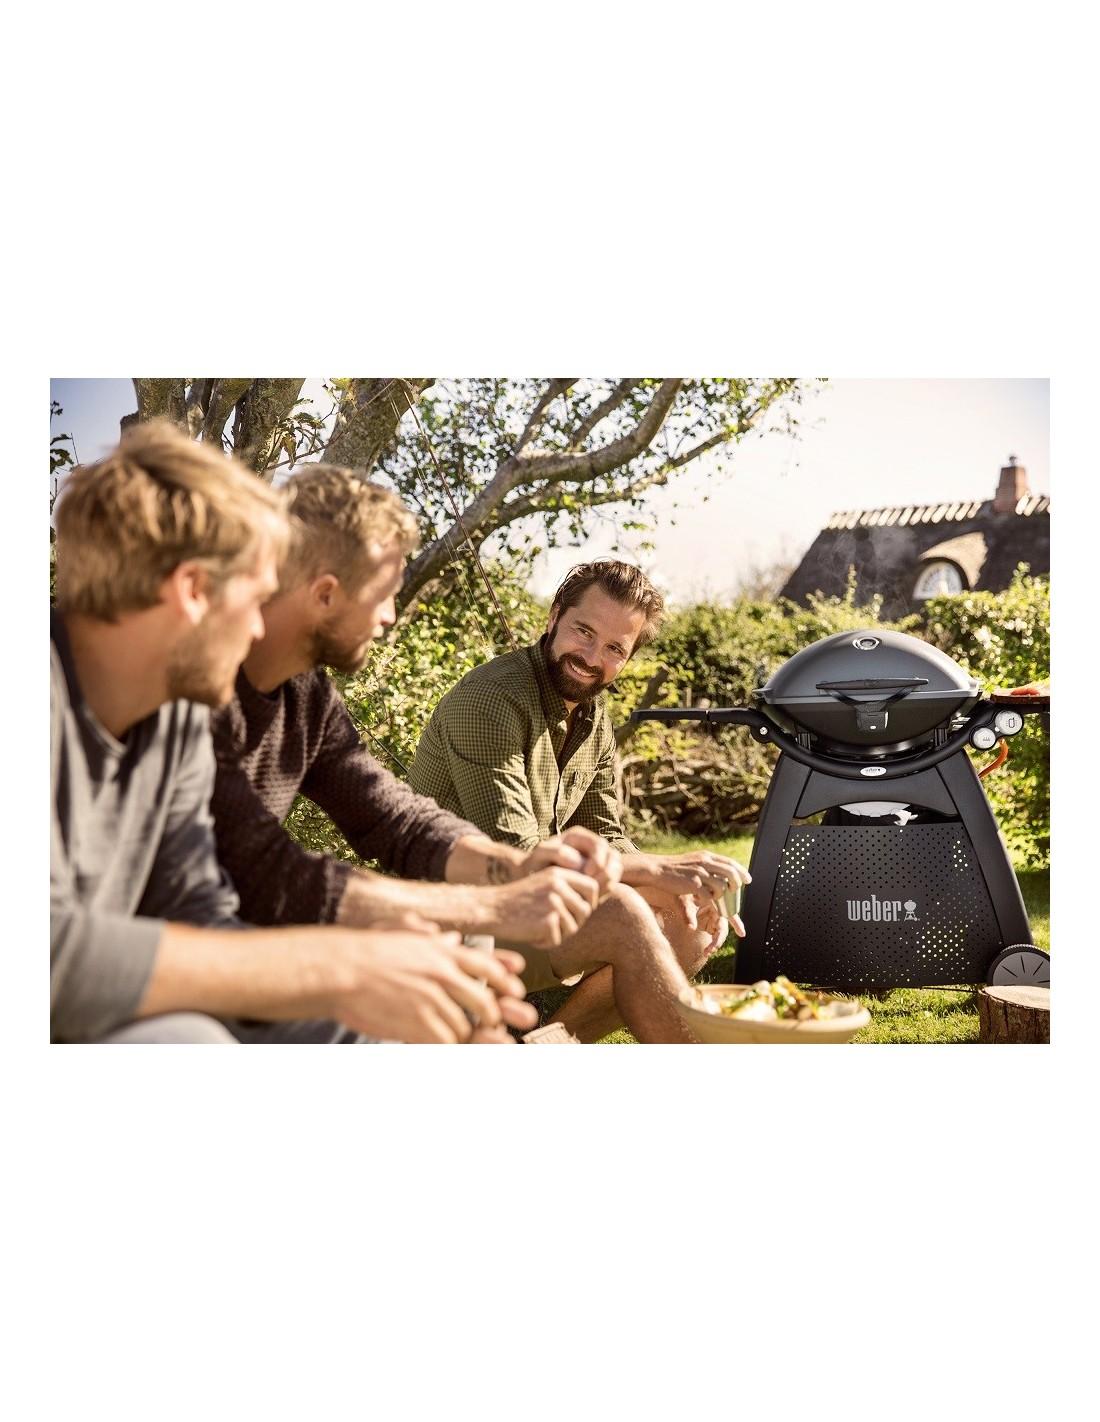 barbecue gaz q3200 black noir avec chariot weber. Black Bedroom Furniture Sets. Home Design Ideas